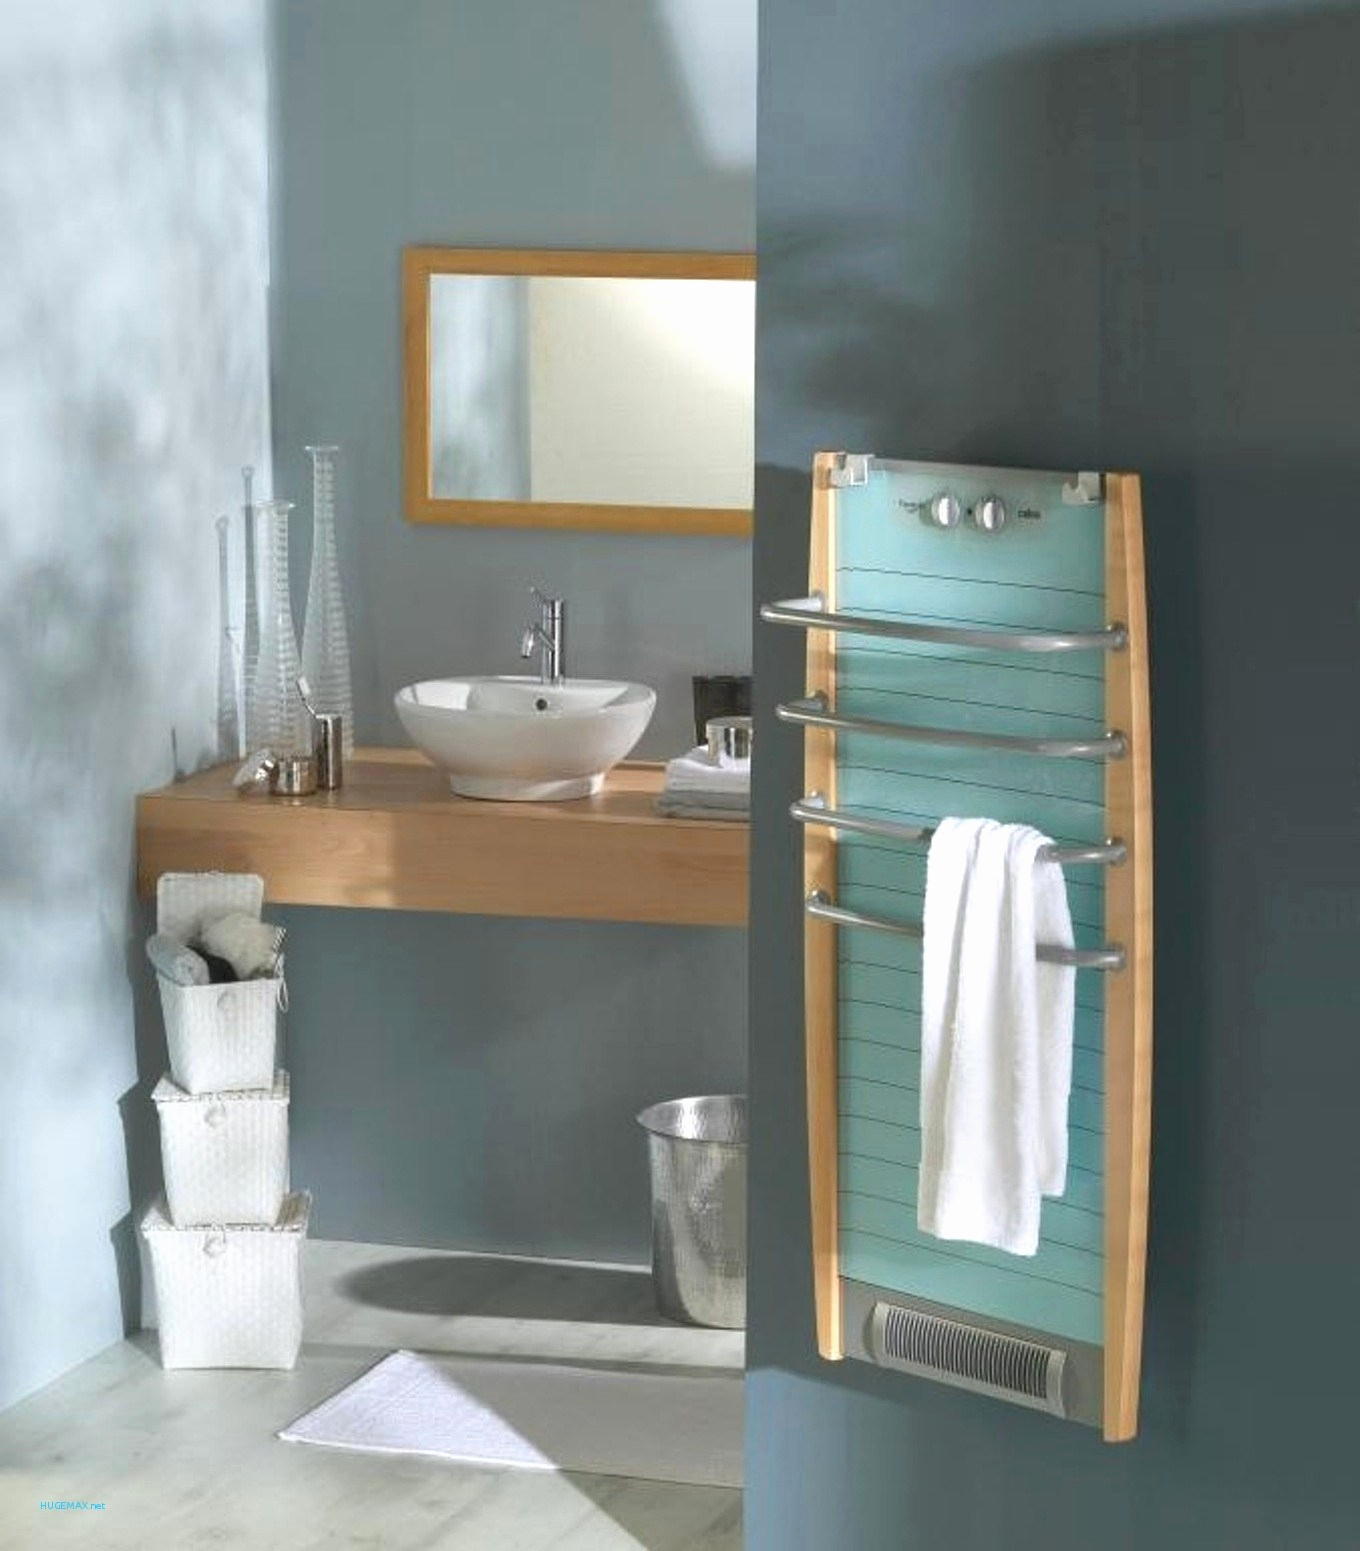 faience coloree salle de bain frais faience salle de bain couleur mostonp of faience coloree salle de bain